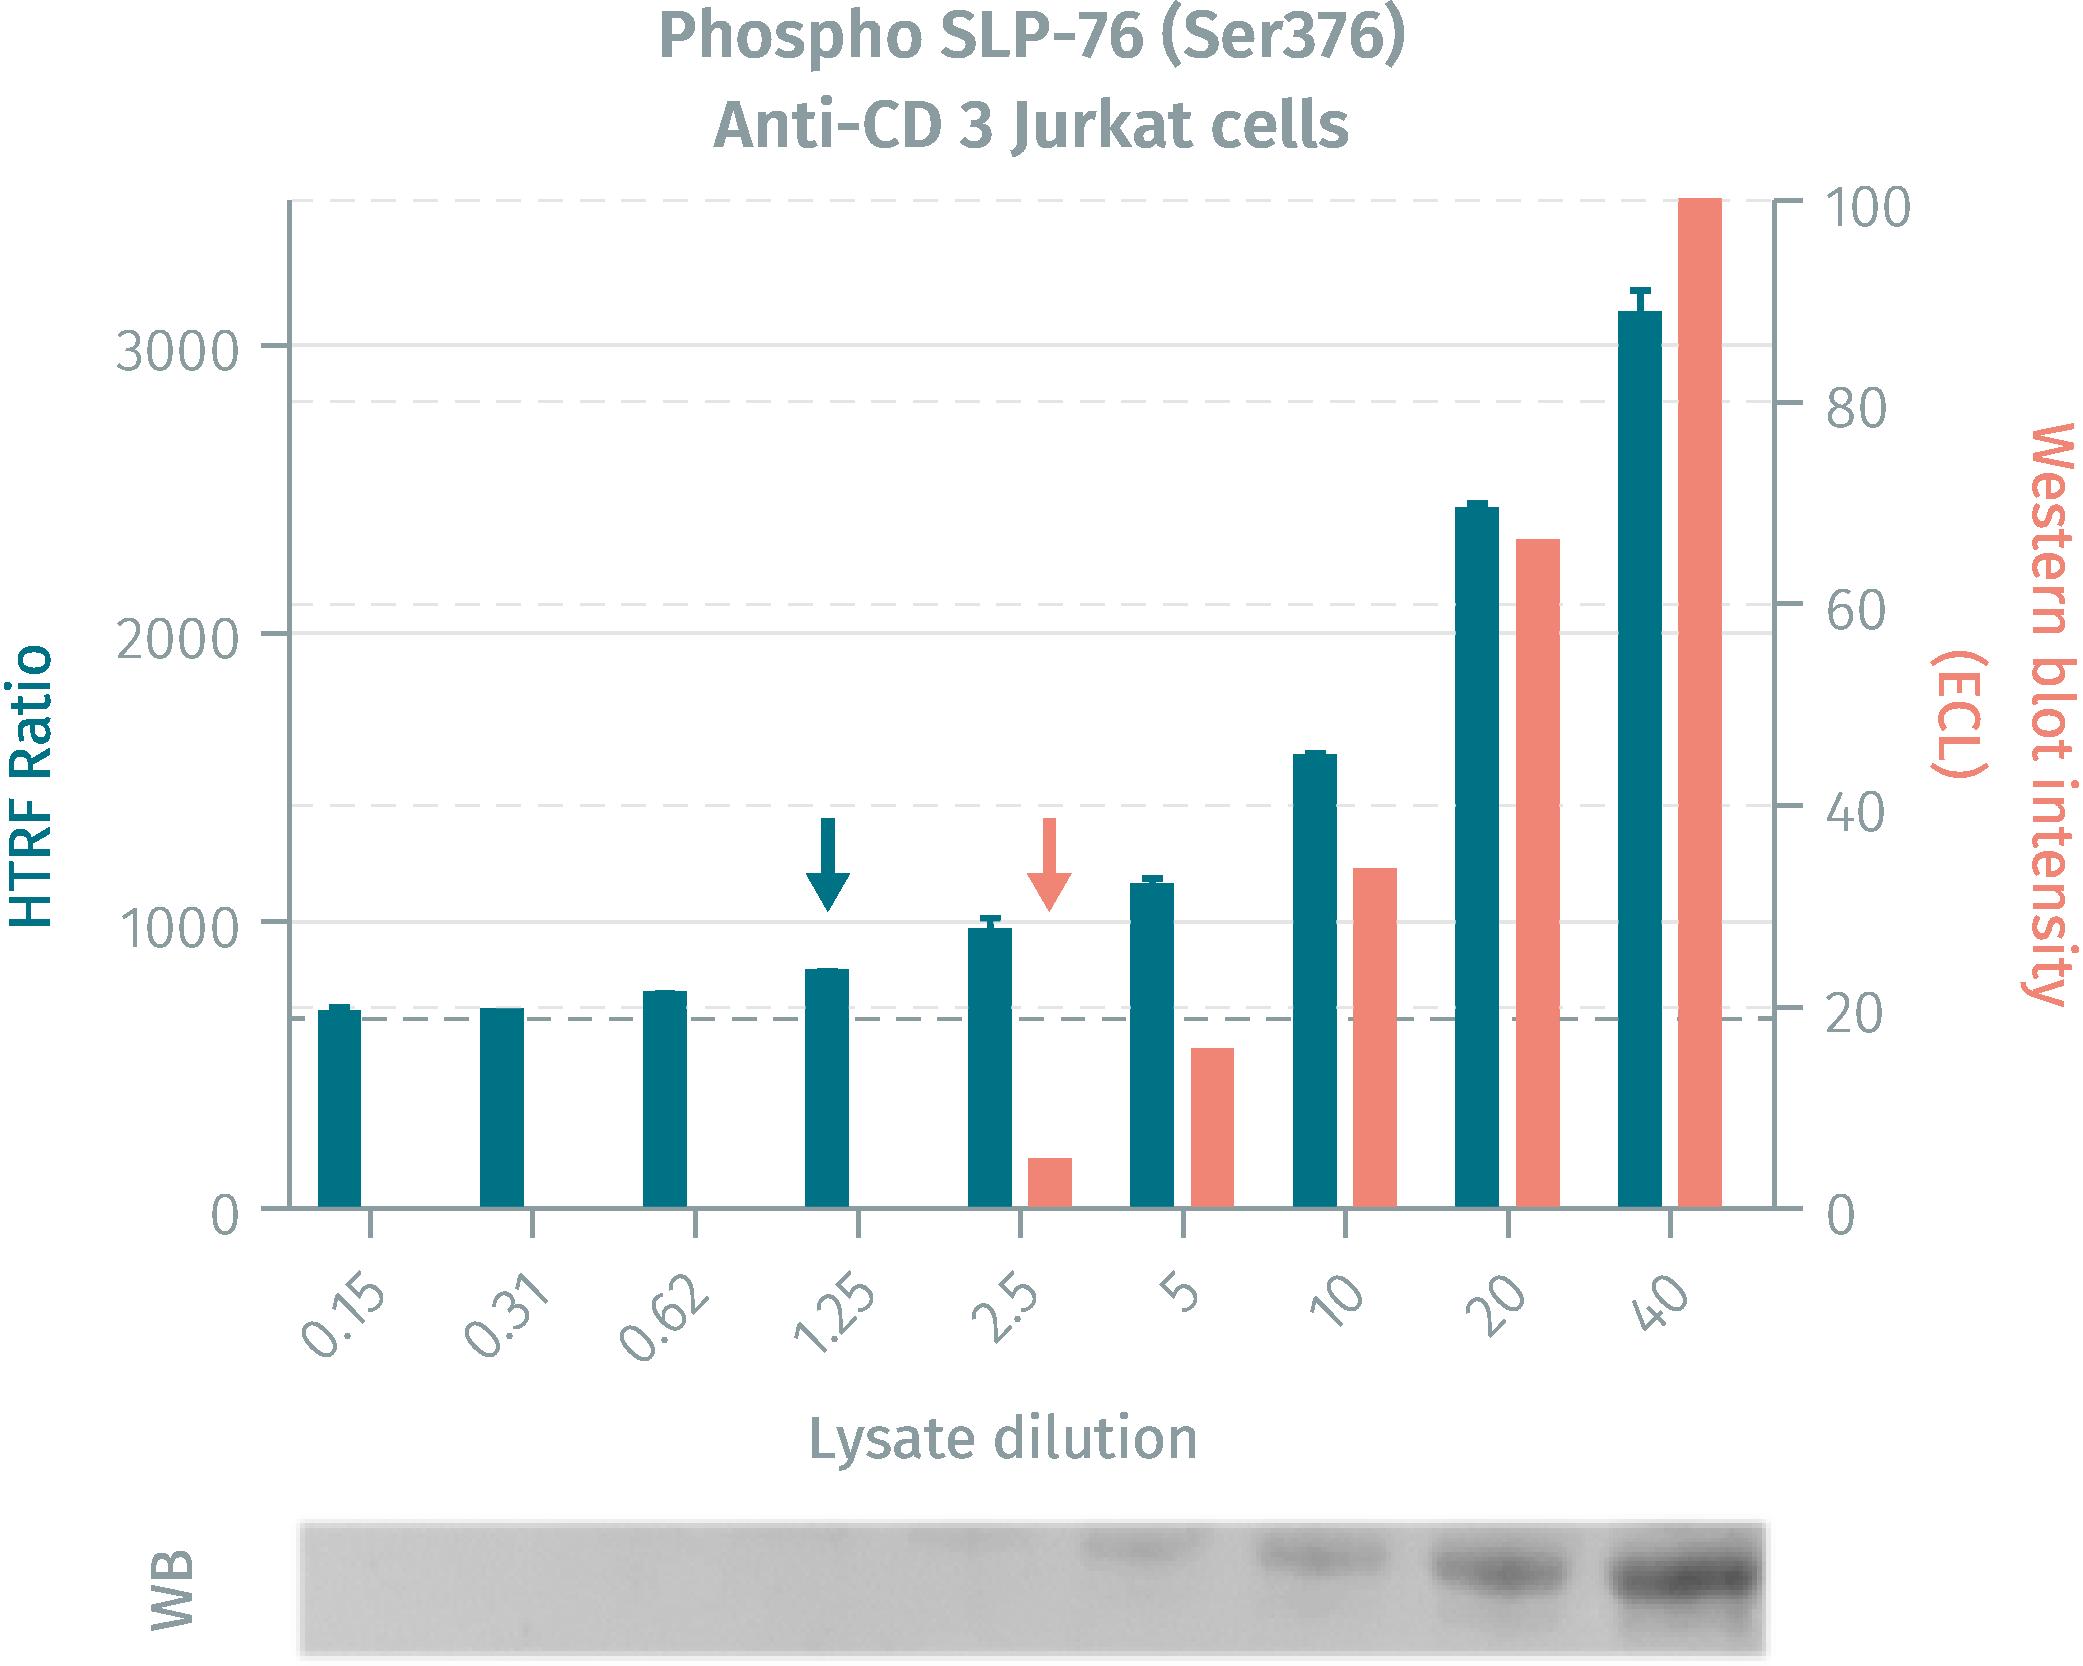 HTRF assay compared to Western Blot using phospho SLP-76 (Ser376) cellular assays on human Jurkat cells